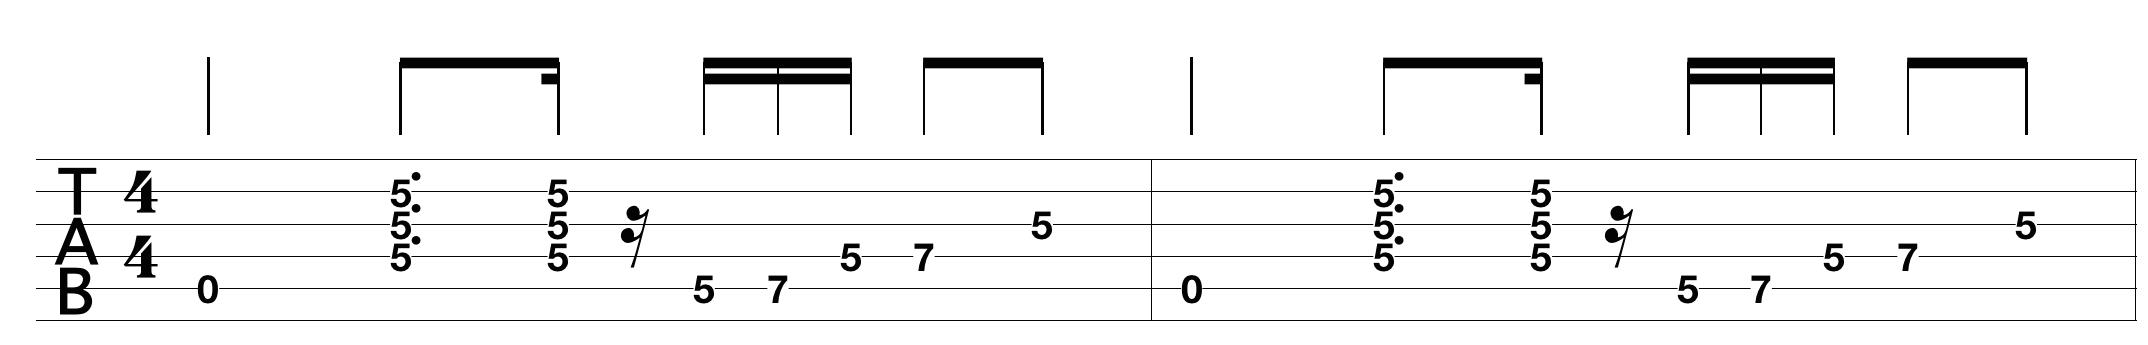 rhythm-guitars_1.png